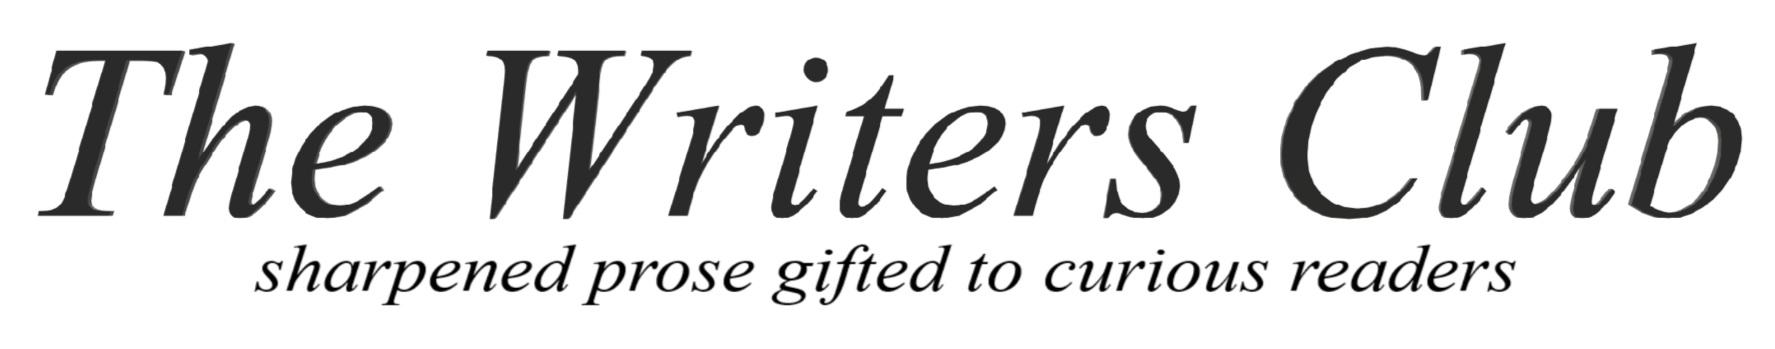 The Writers Club, writing, authors, writers, writer, write, prose, literature, poetry, flash fiction, short story, novel